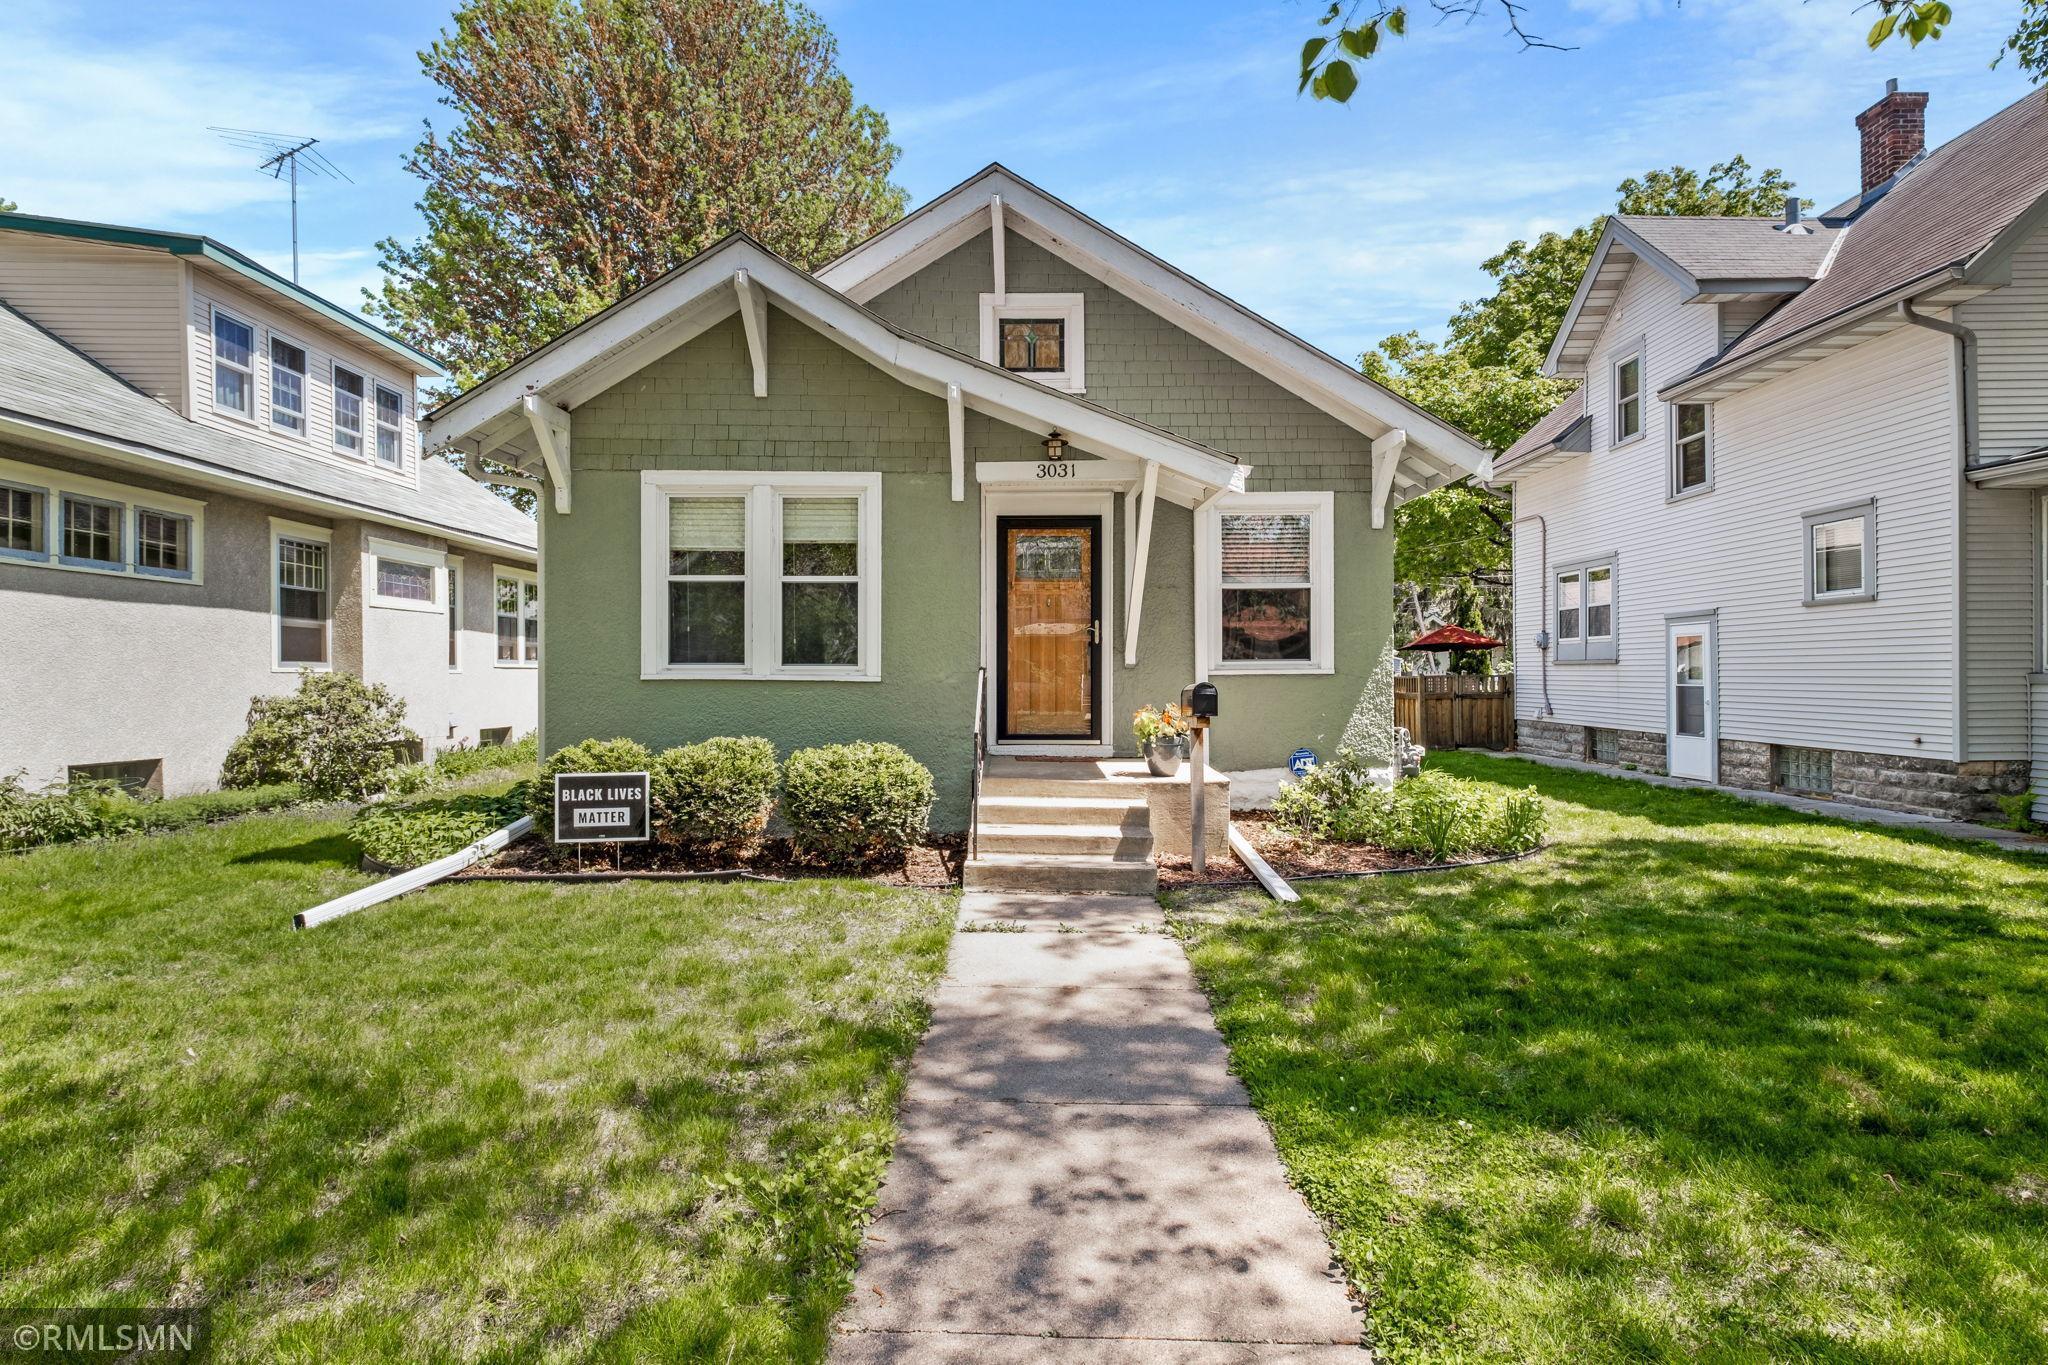 3031 32nd Avenue S, Minneapolis MN 55406 - Photo 1